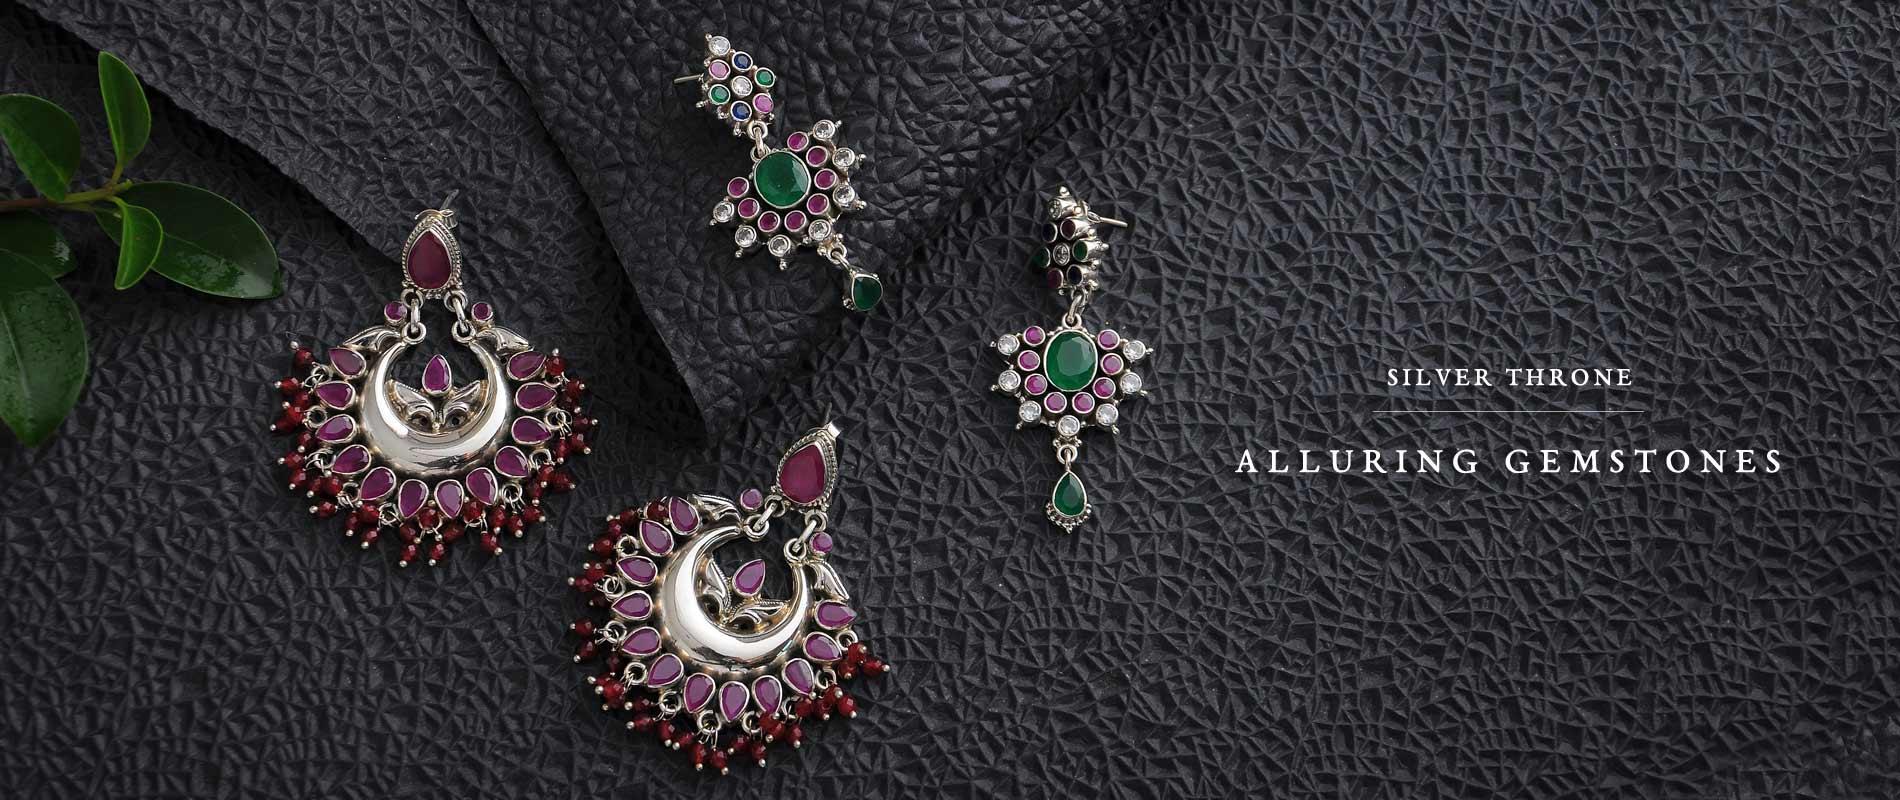 170901KLJ173R_KLJ_Kailash_Jewellers_Relaunch_7377